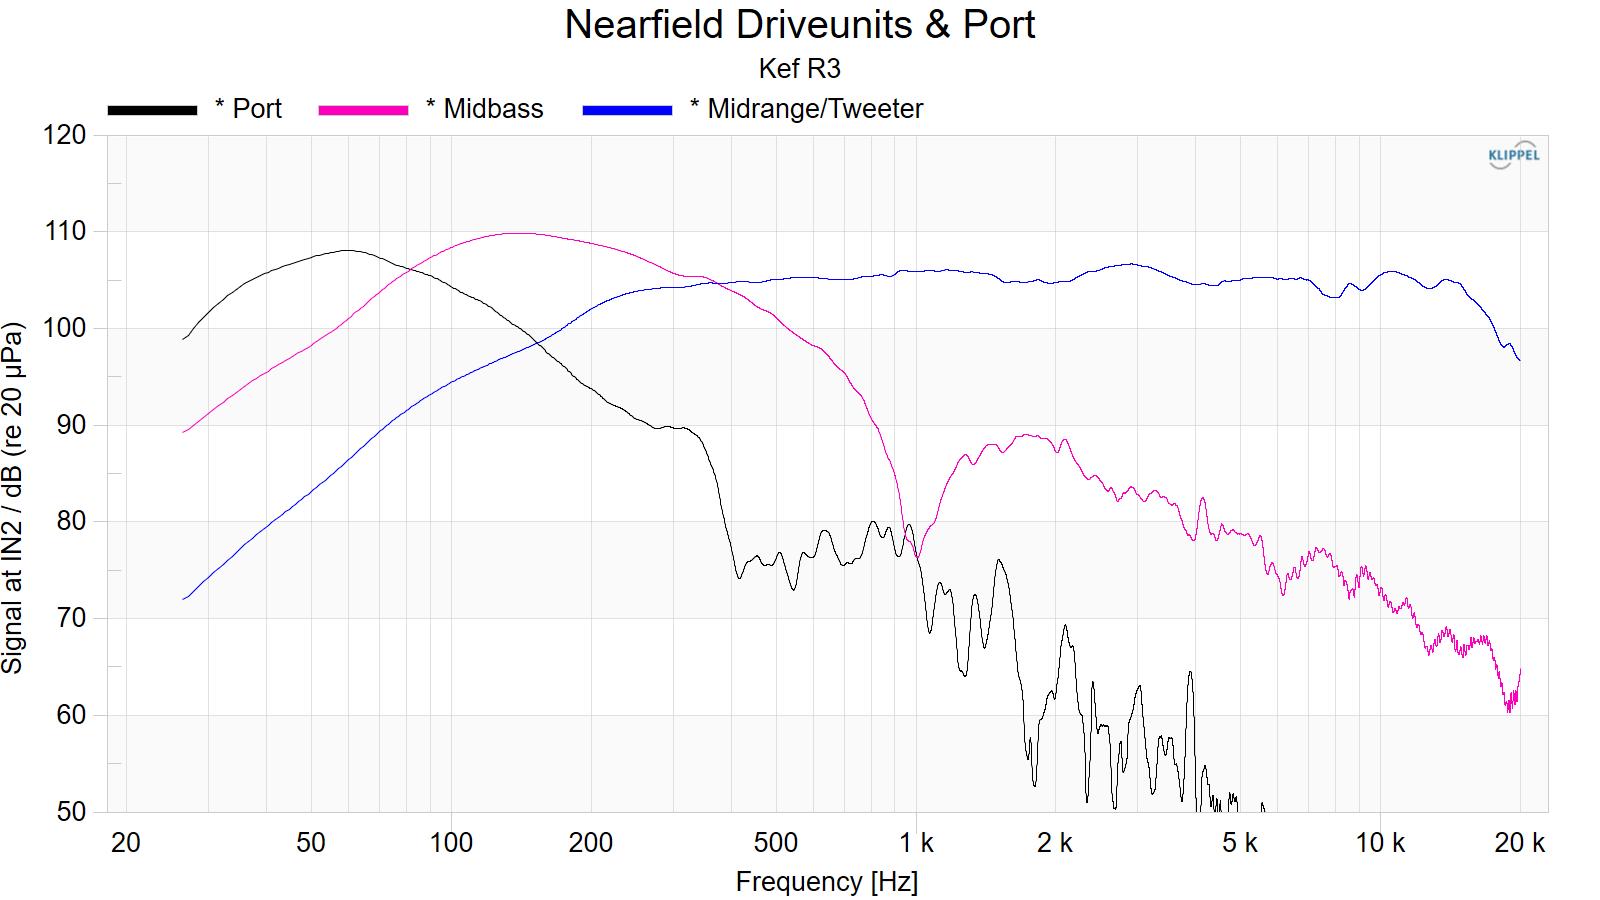 Nearfield%20Driveunits%20%26%20Port.png